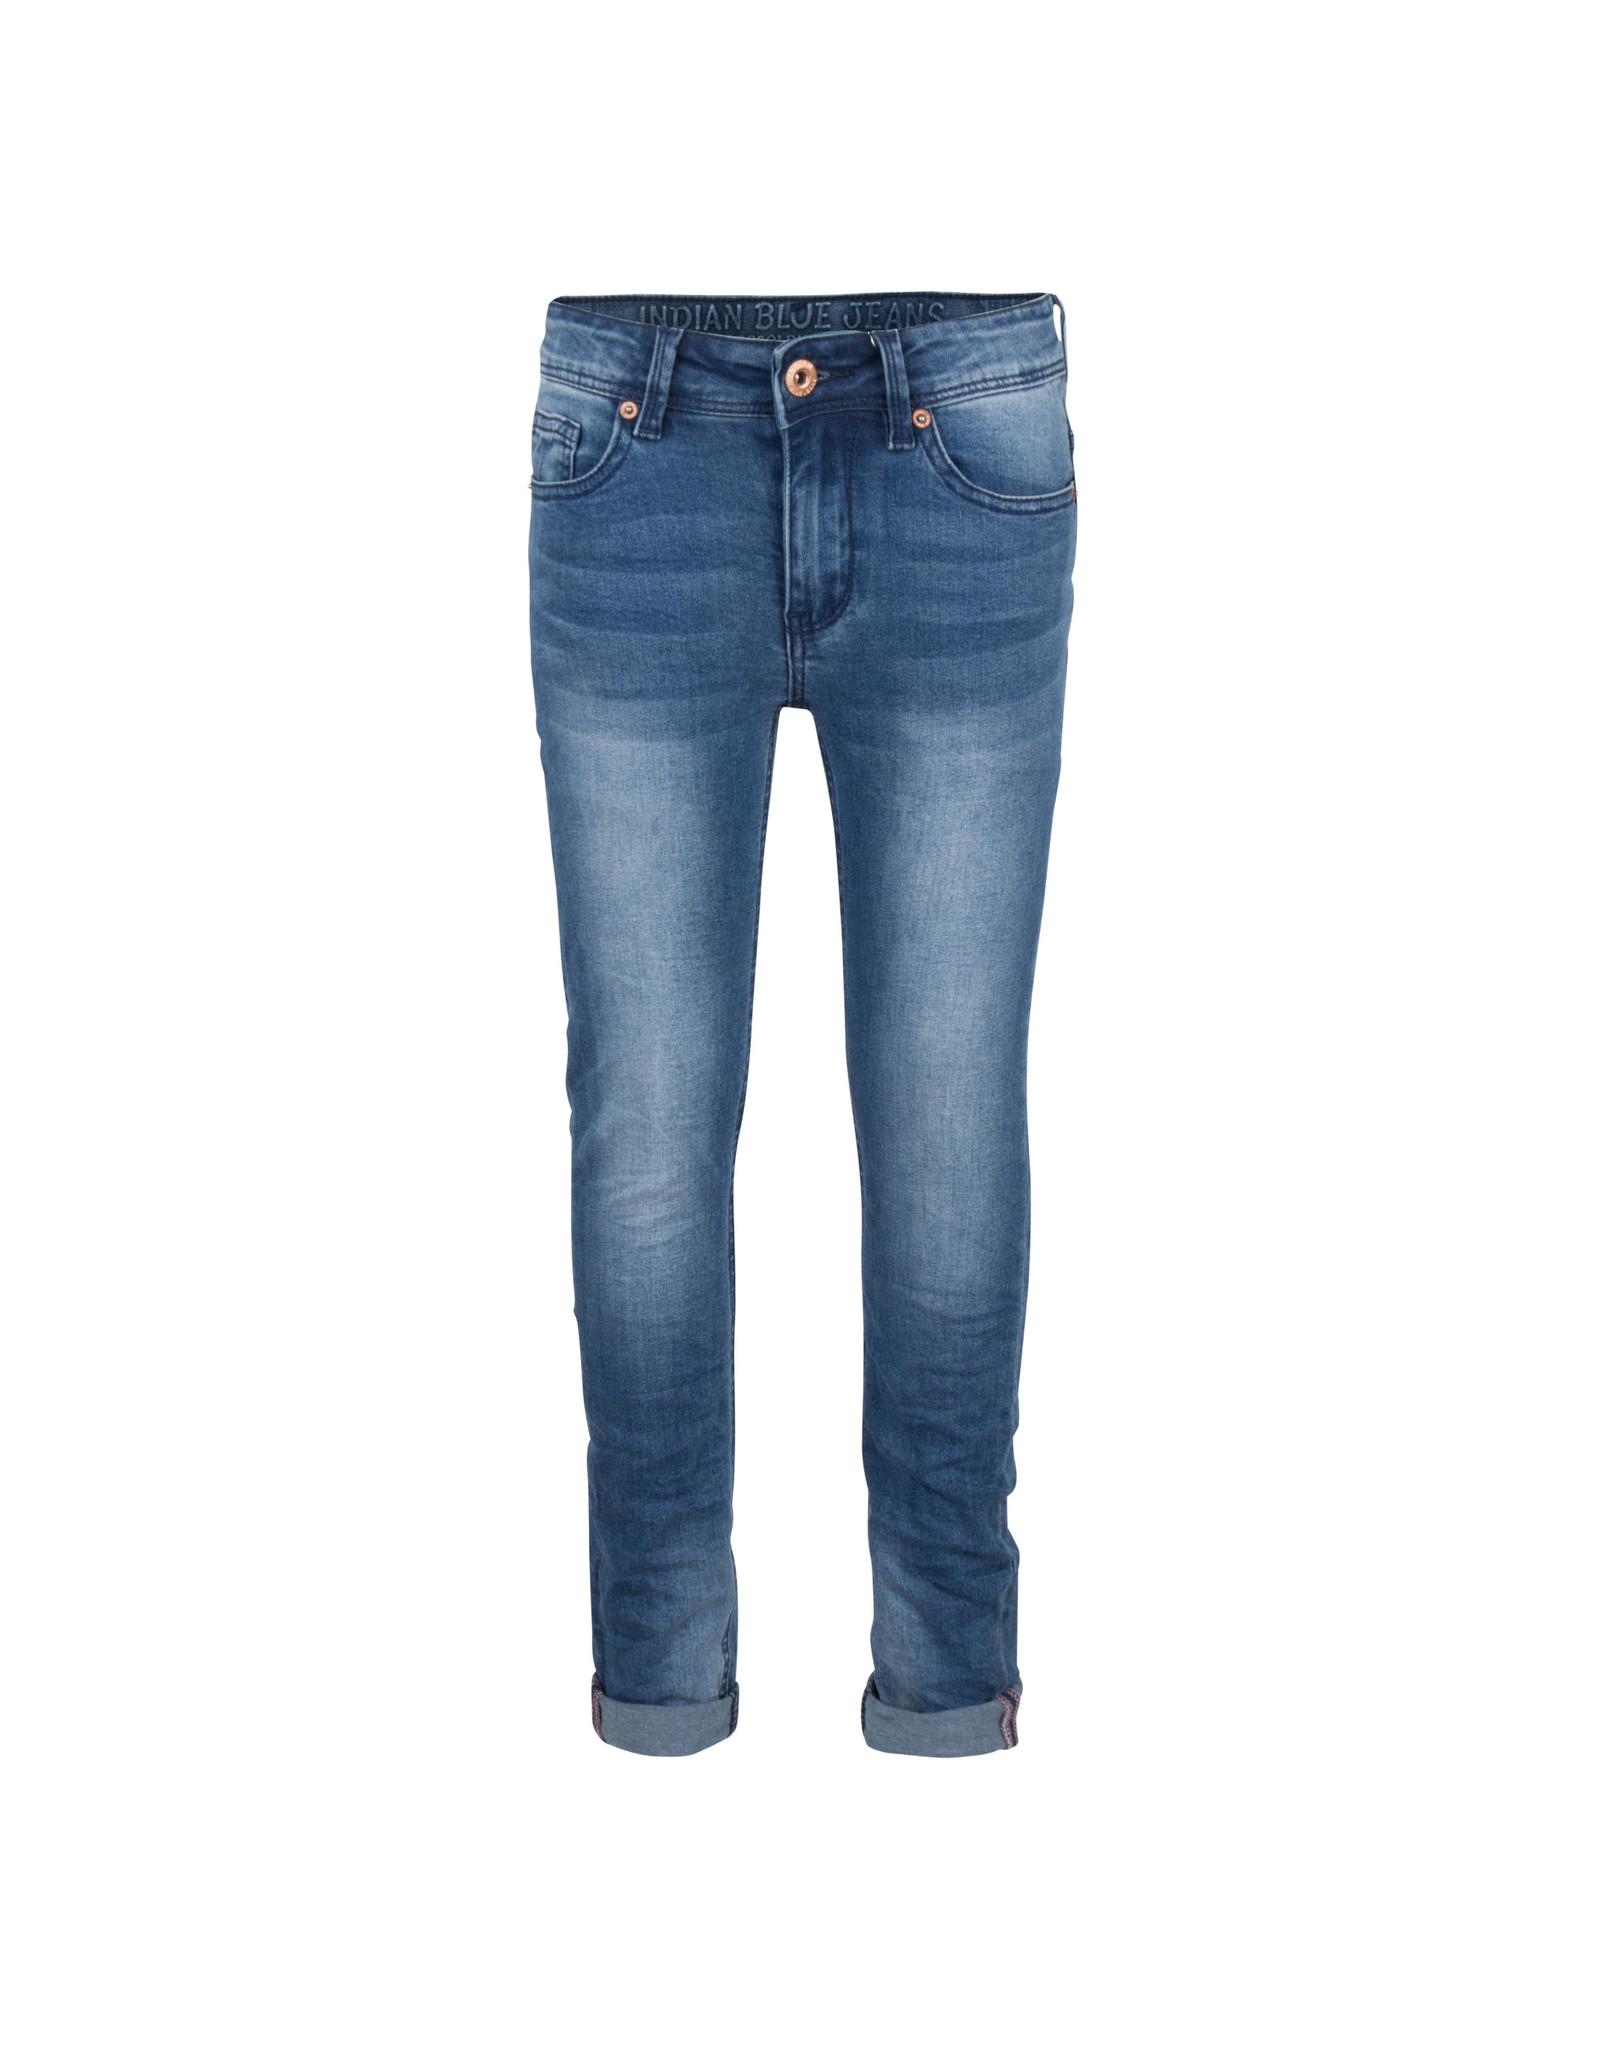 Indian Blue jeans IBB19-2710 dark denim  164/14